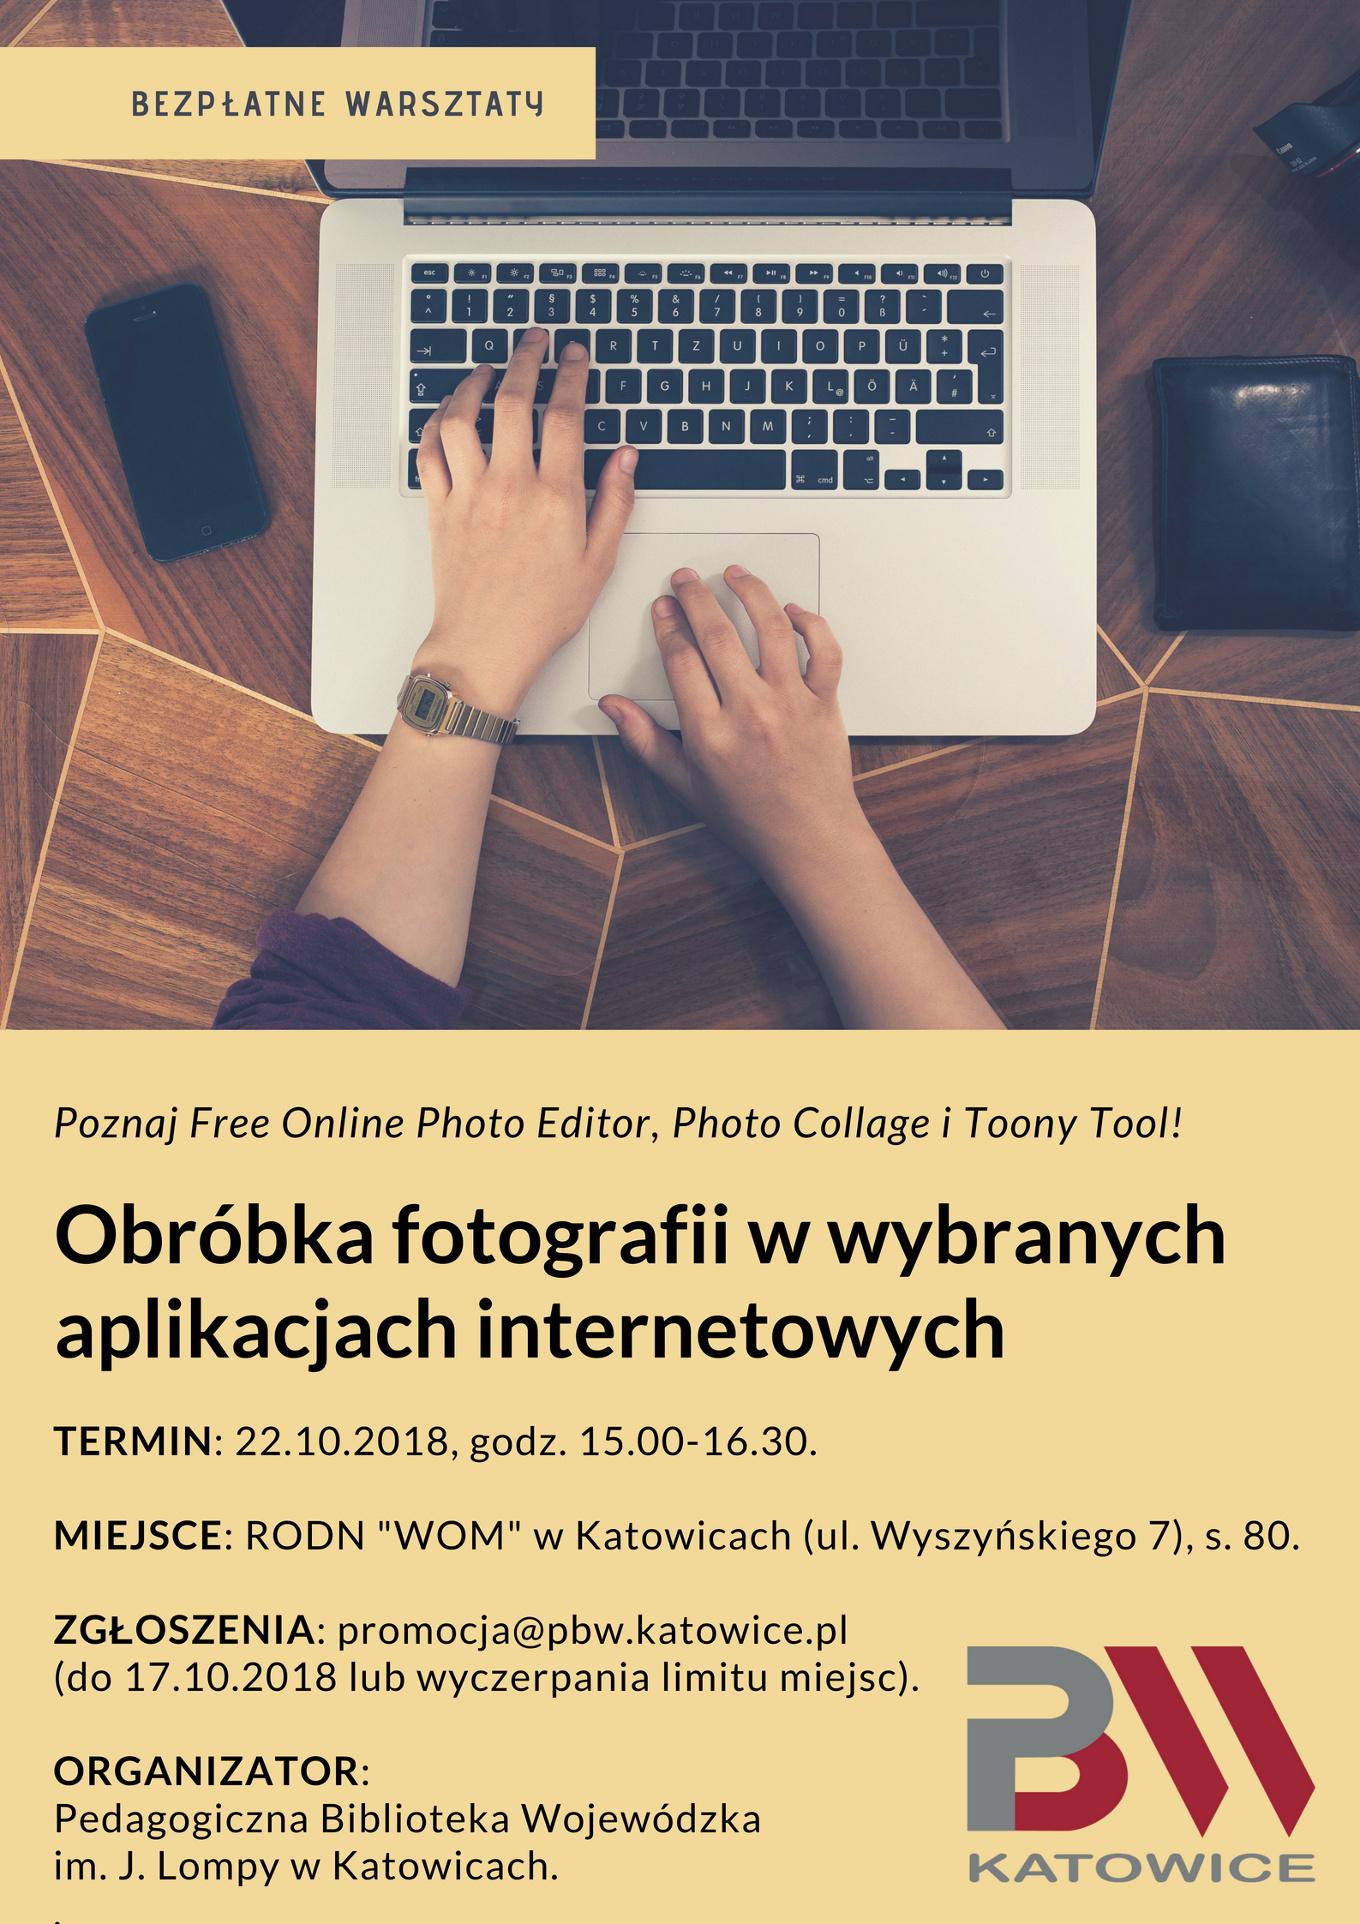 Obróbka fotografii - plakat informacyjny